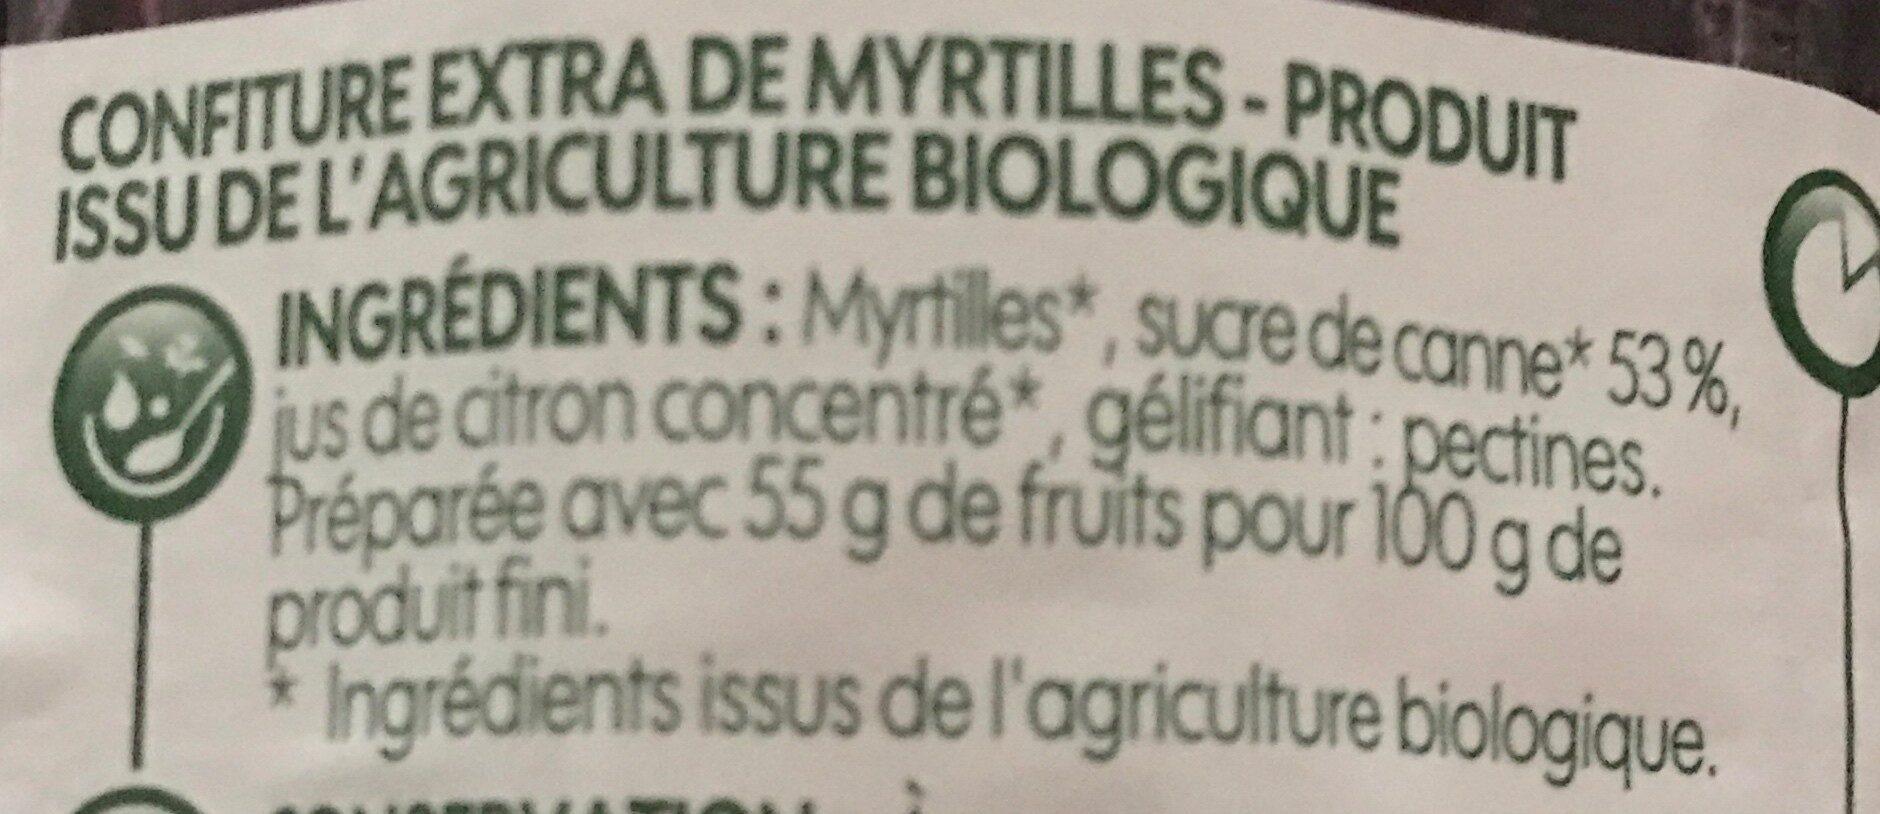 Confiture Myrtilles - Ingredienti - fr